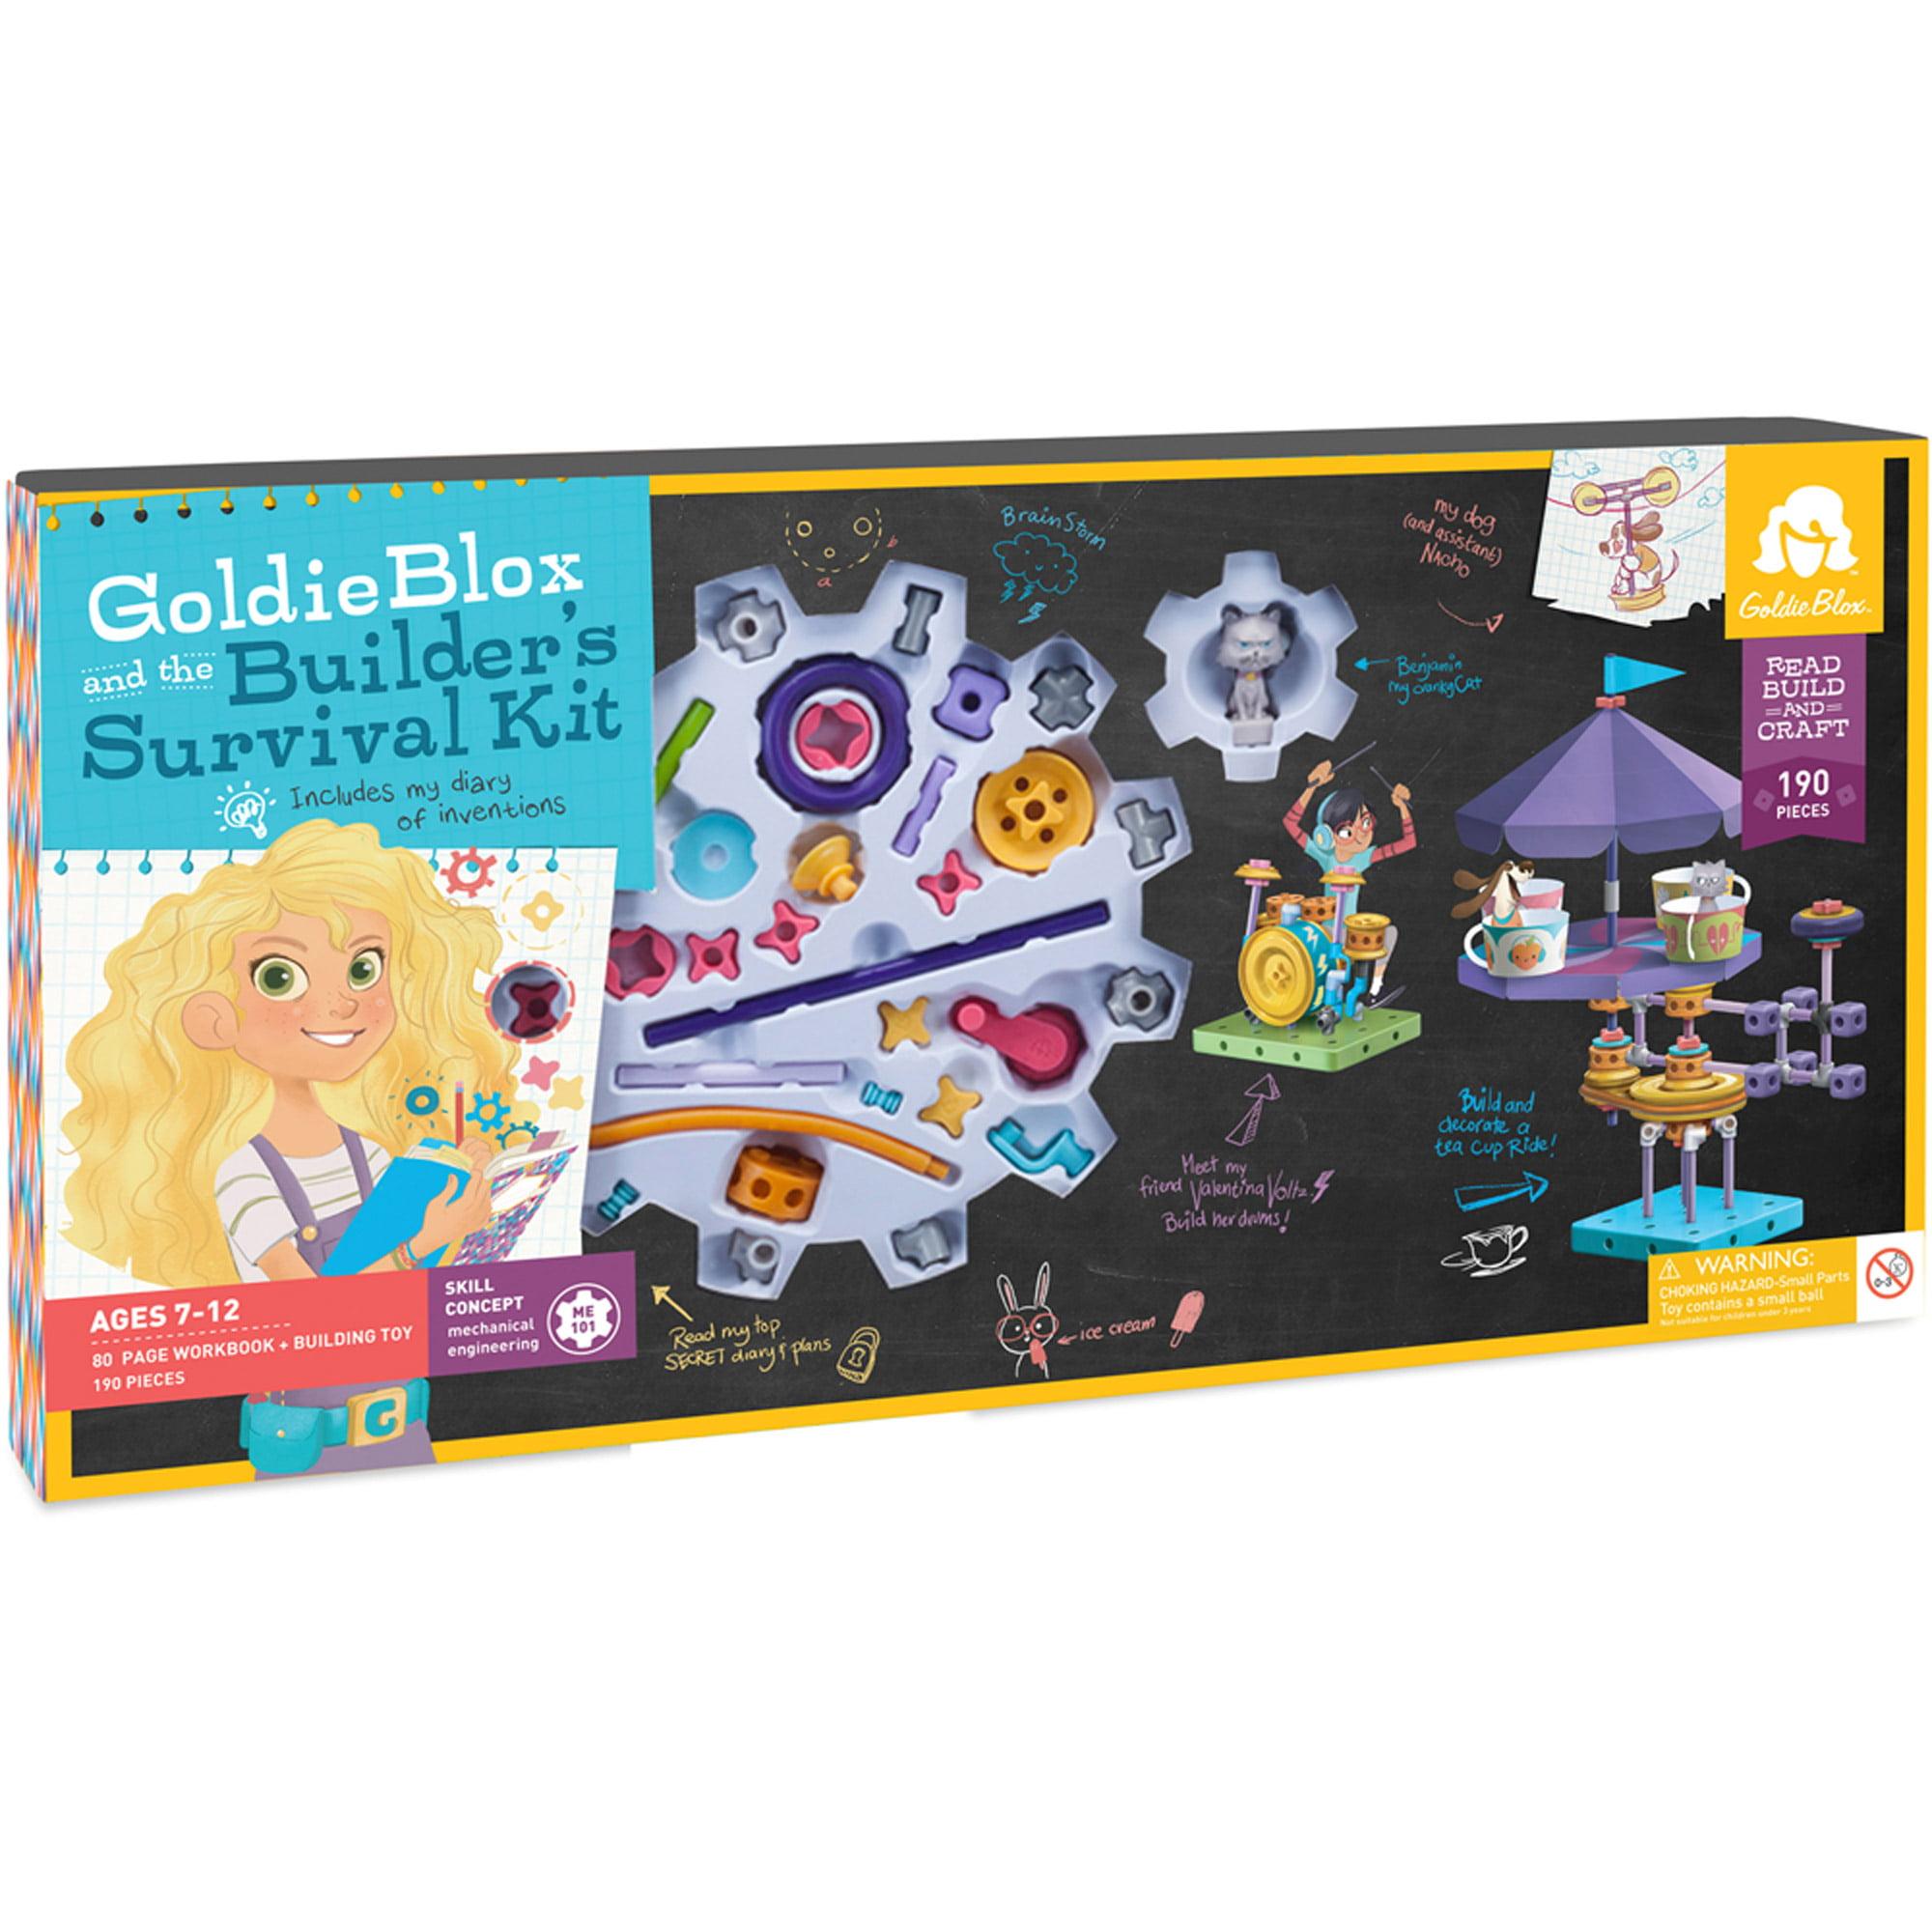 GoldieBlox and the Builder's Survival Kit by GoldieBlox